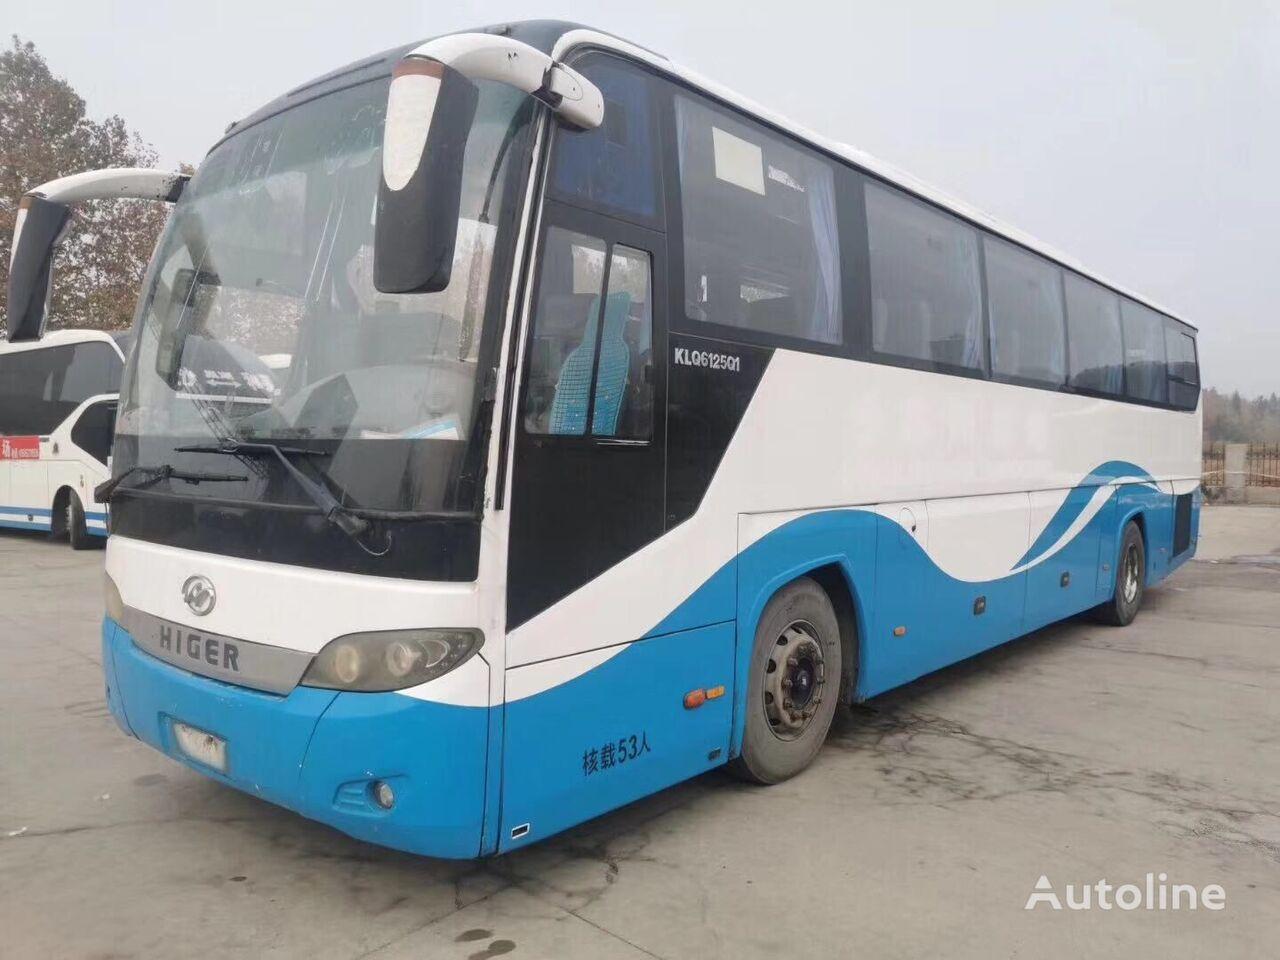 HIGER interurban bus